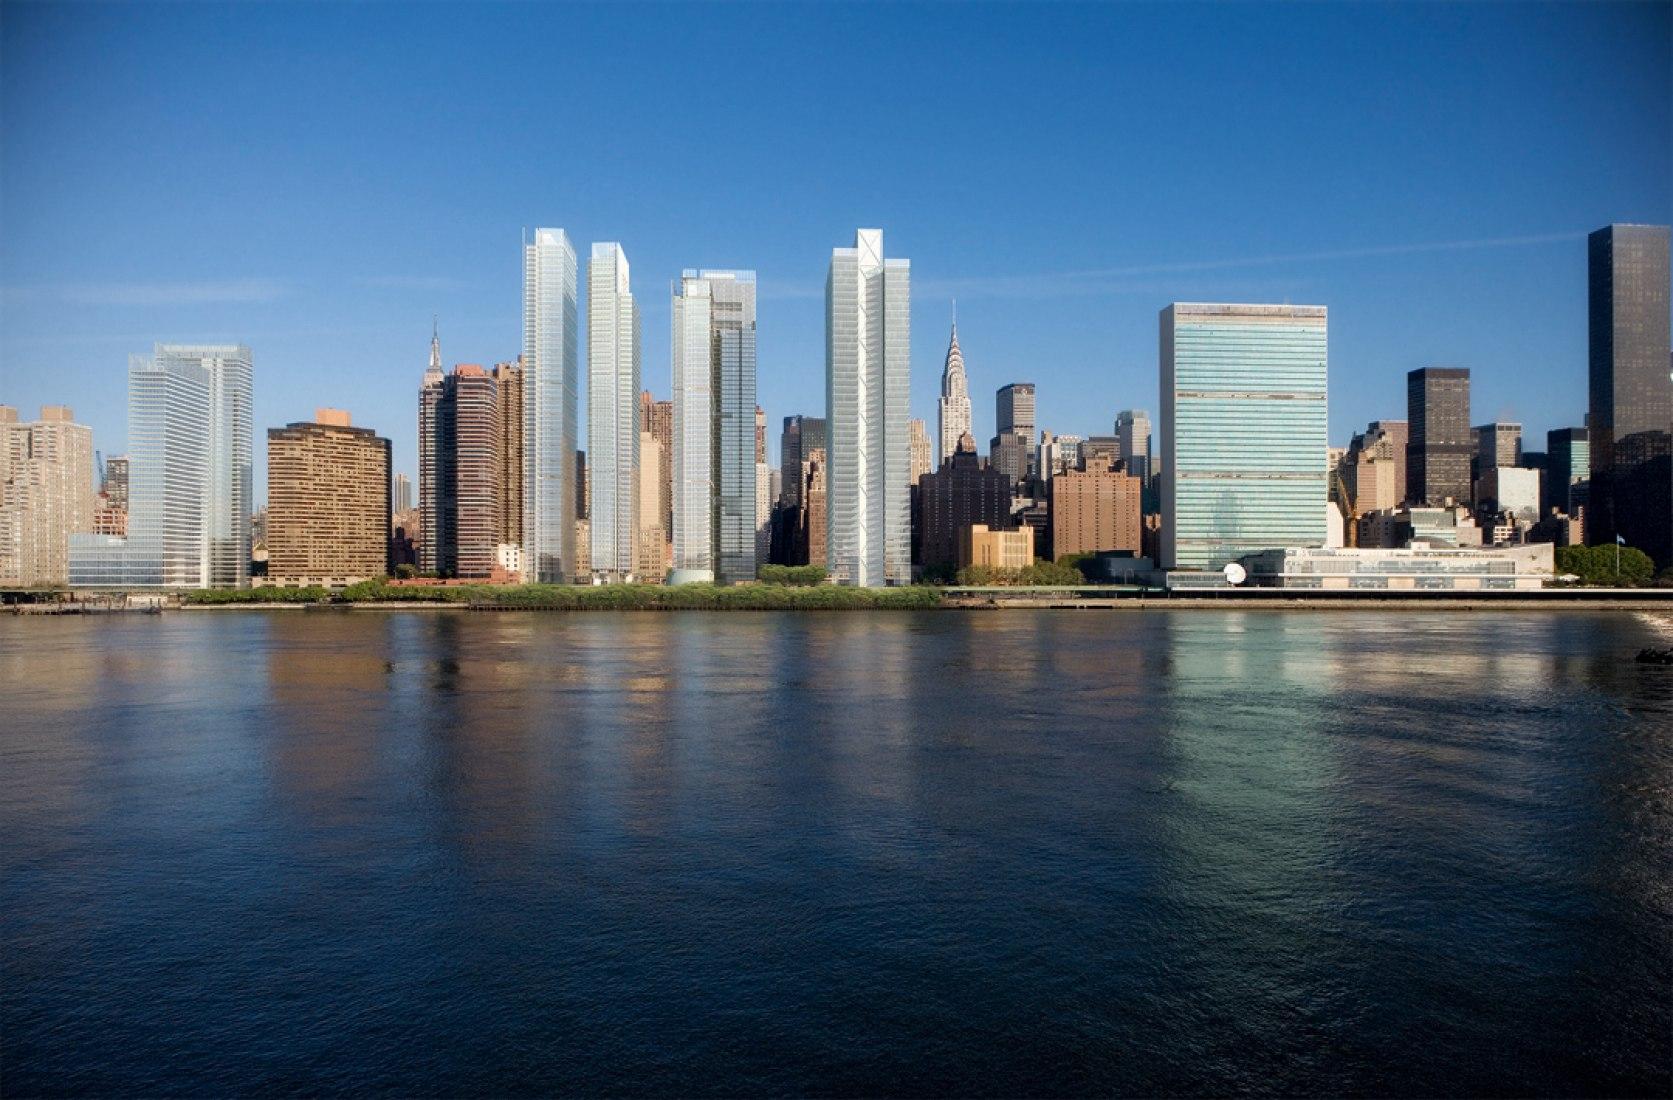 East River Master Plan, New York, NY. Fotografía © Richard Meier & Partners Architects LLP. Richard Meier & Partners. Complete Works 1963-2013. Imagen cortesía de TASCHEN.